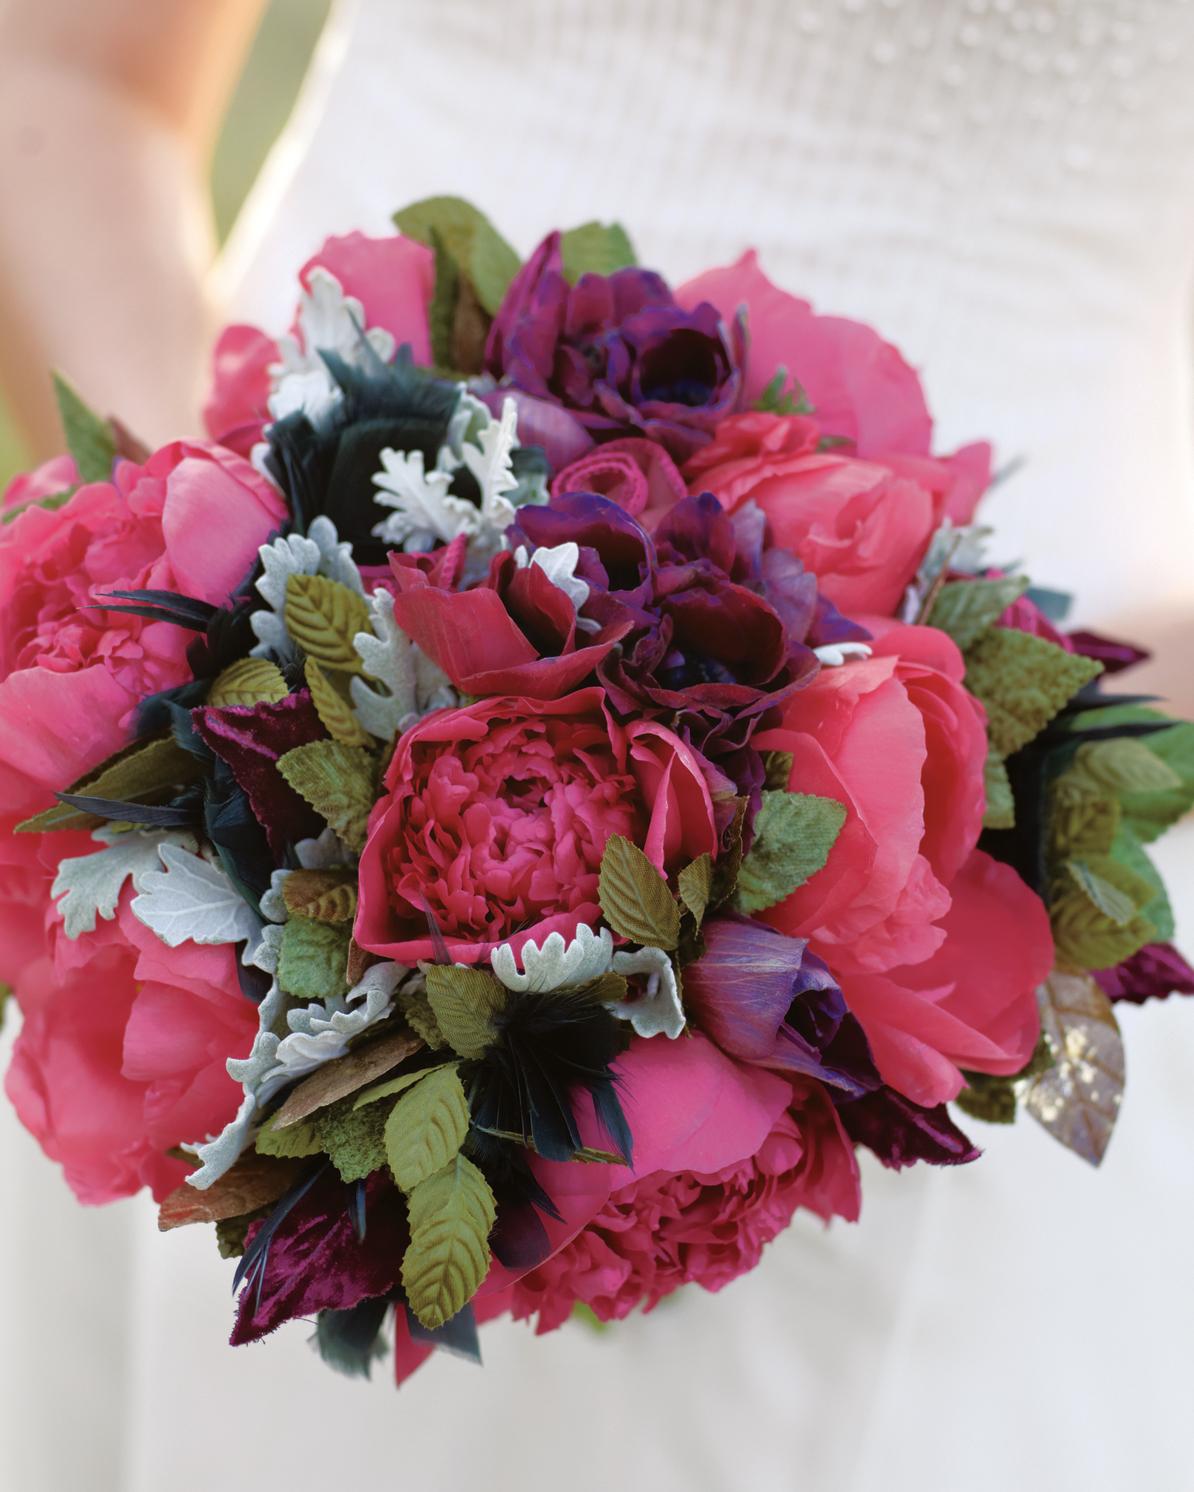 vivid-bouquet-mmwd104892.jpg